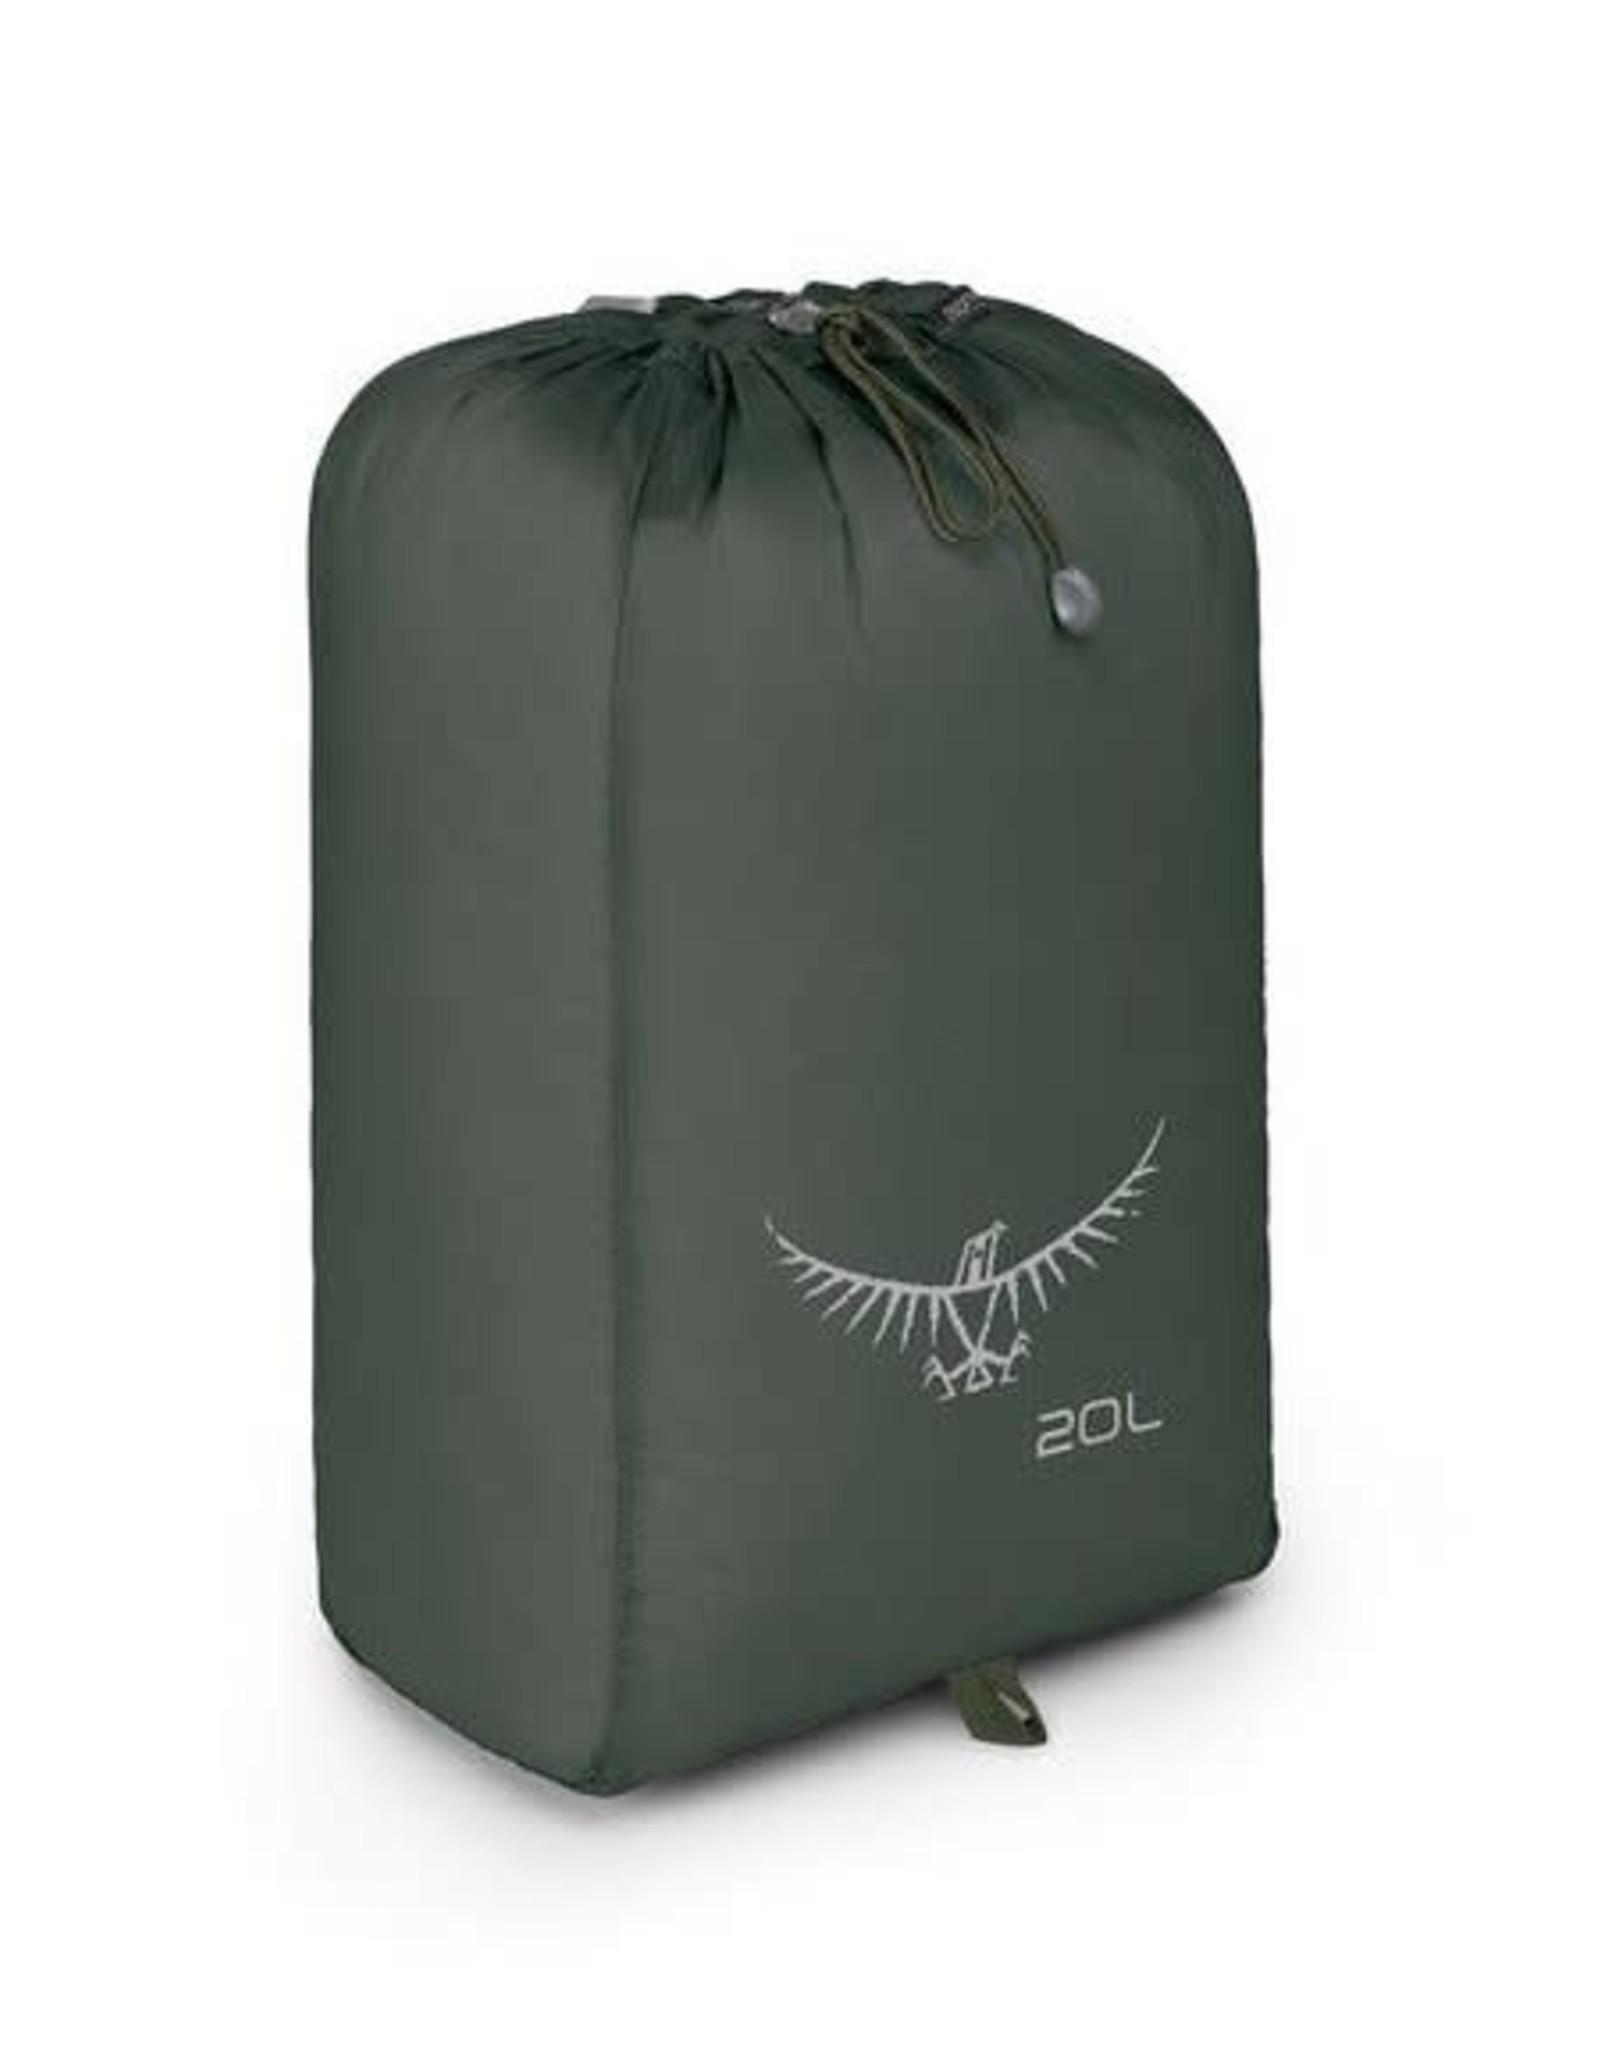 Osprey Osprey UL Stuff Sack 20L